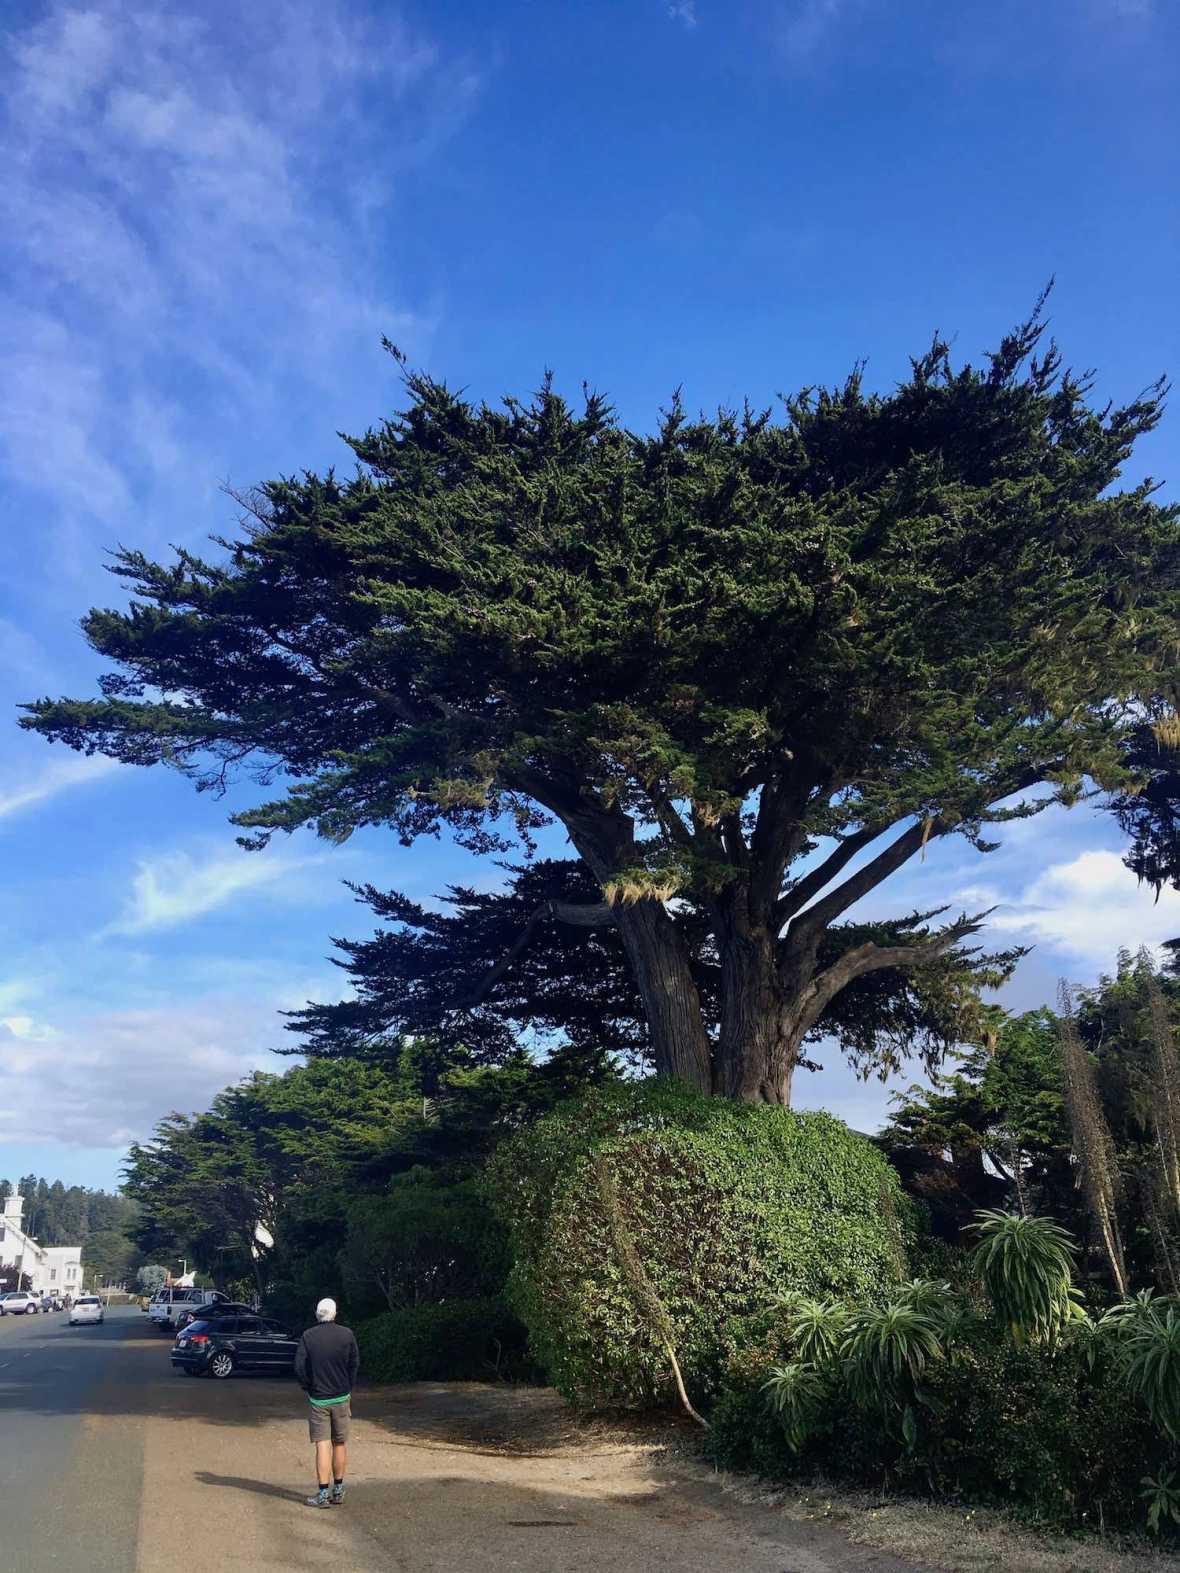 Tree in Mendocino, California